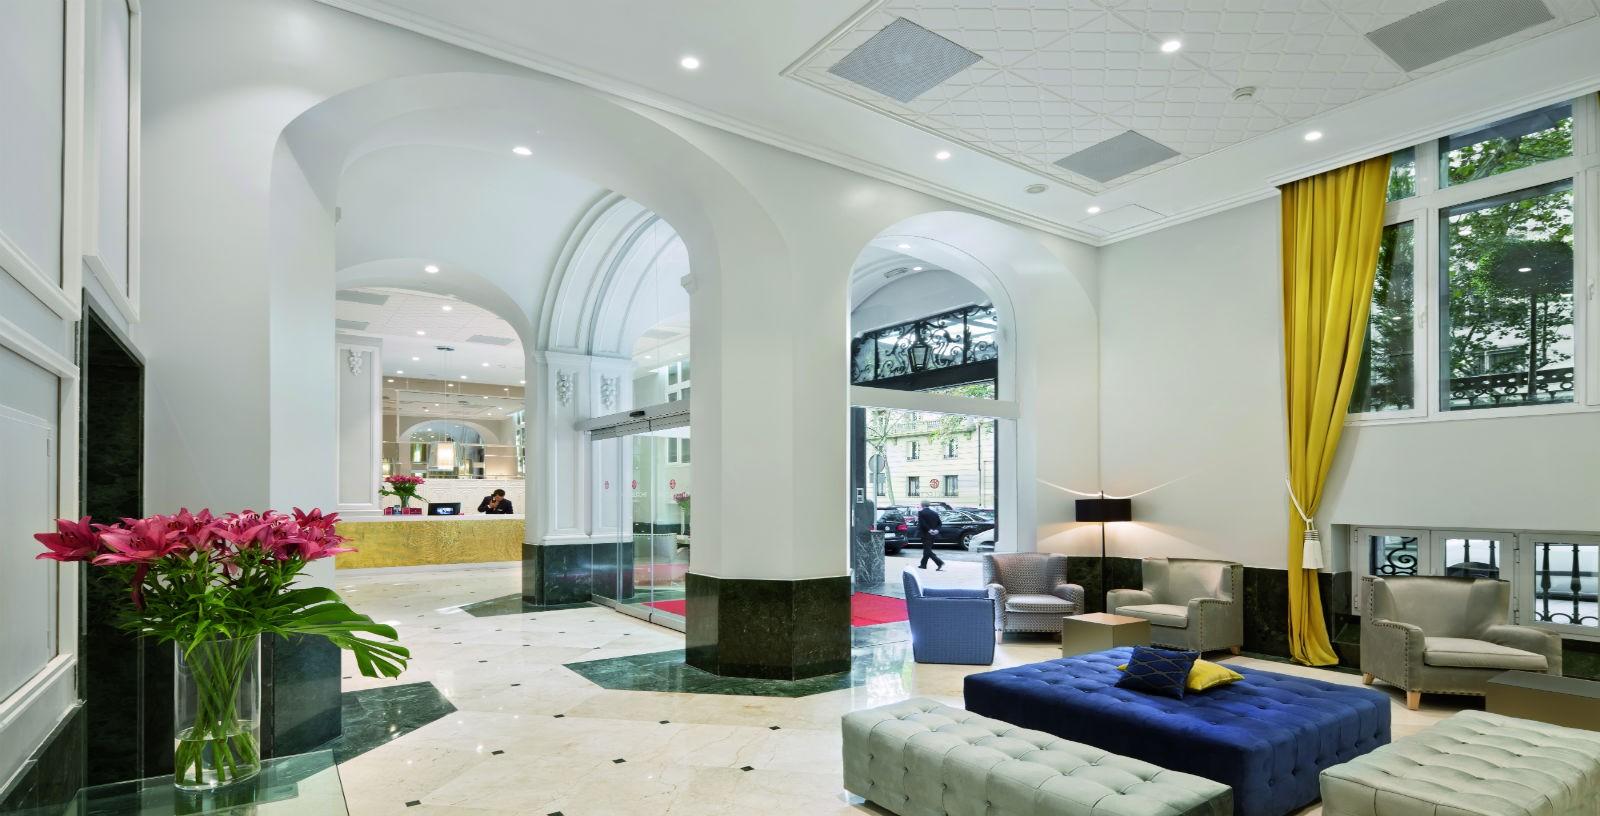 NH_ABASCAL_HOTEL_02_Architecture_IDOM_Copyright